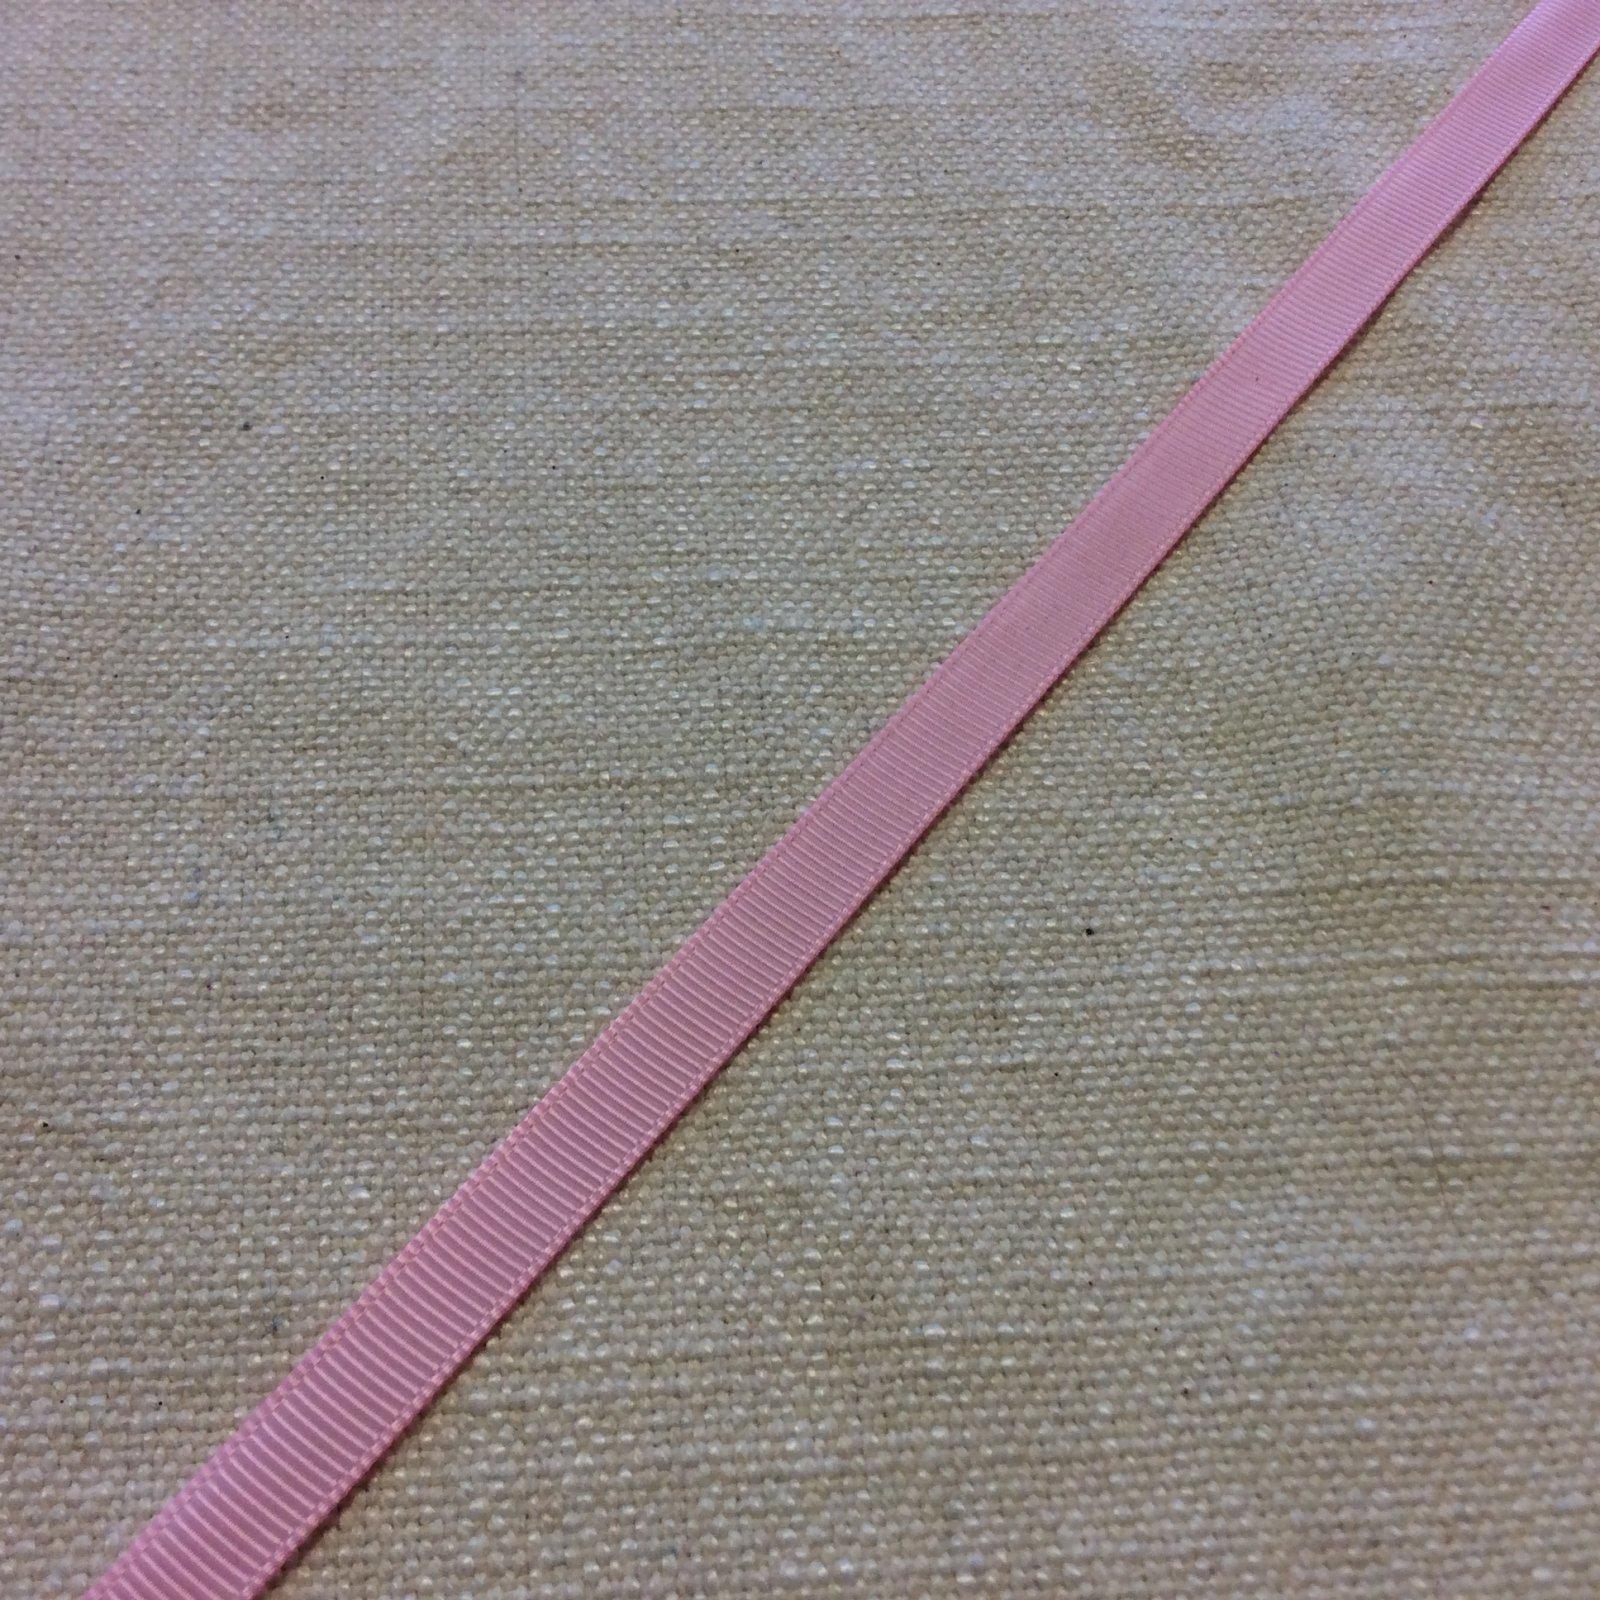 Grosgrain Ribbon 3/8 Pink Trim Ribbon RIB1148